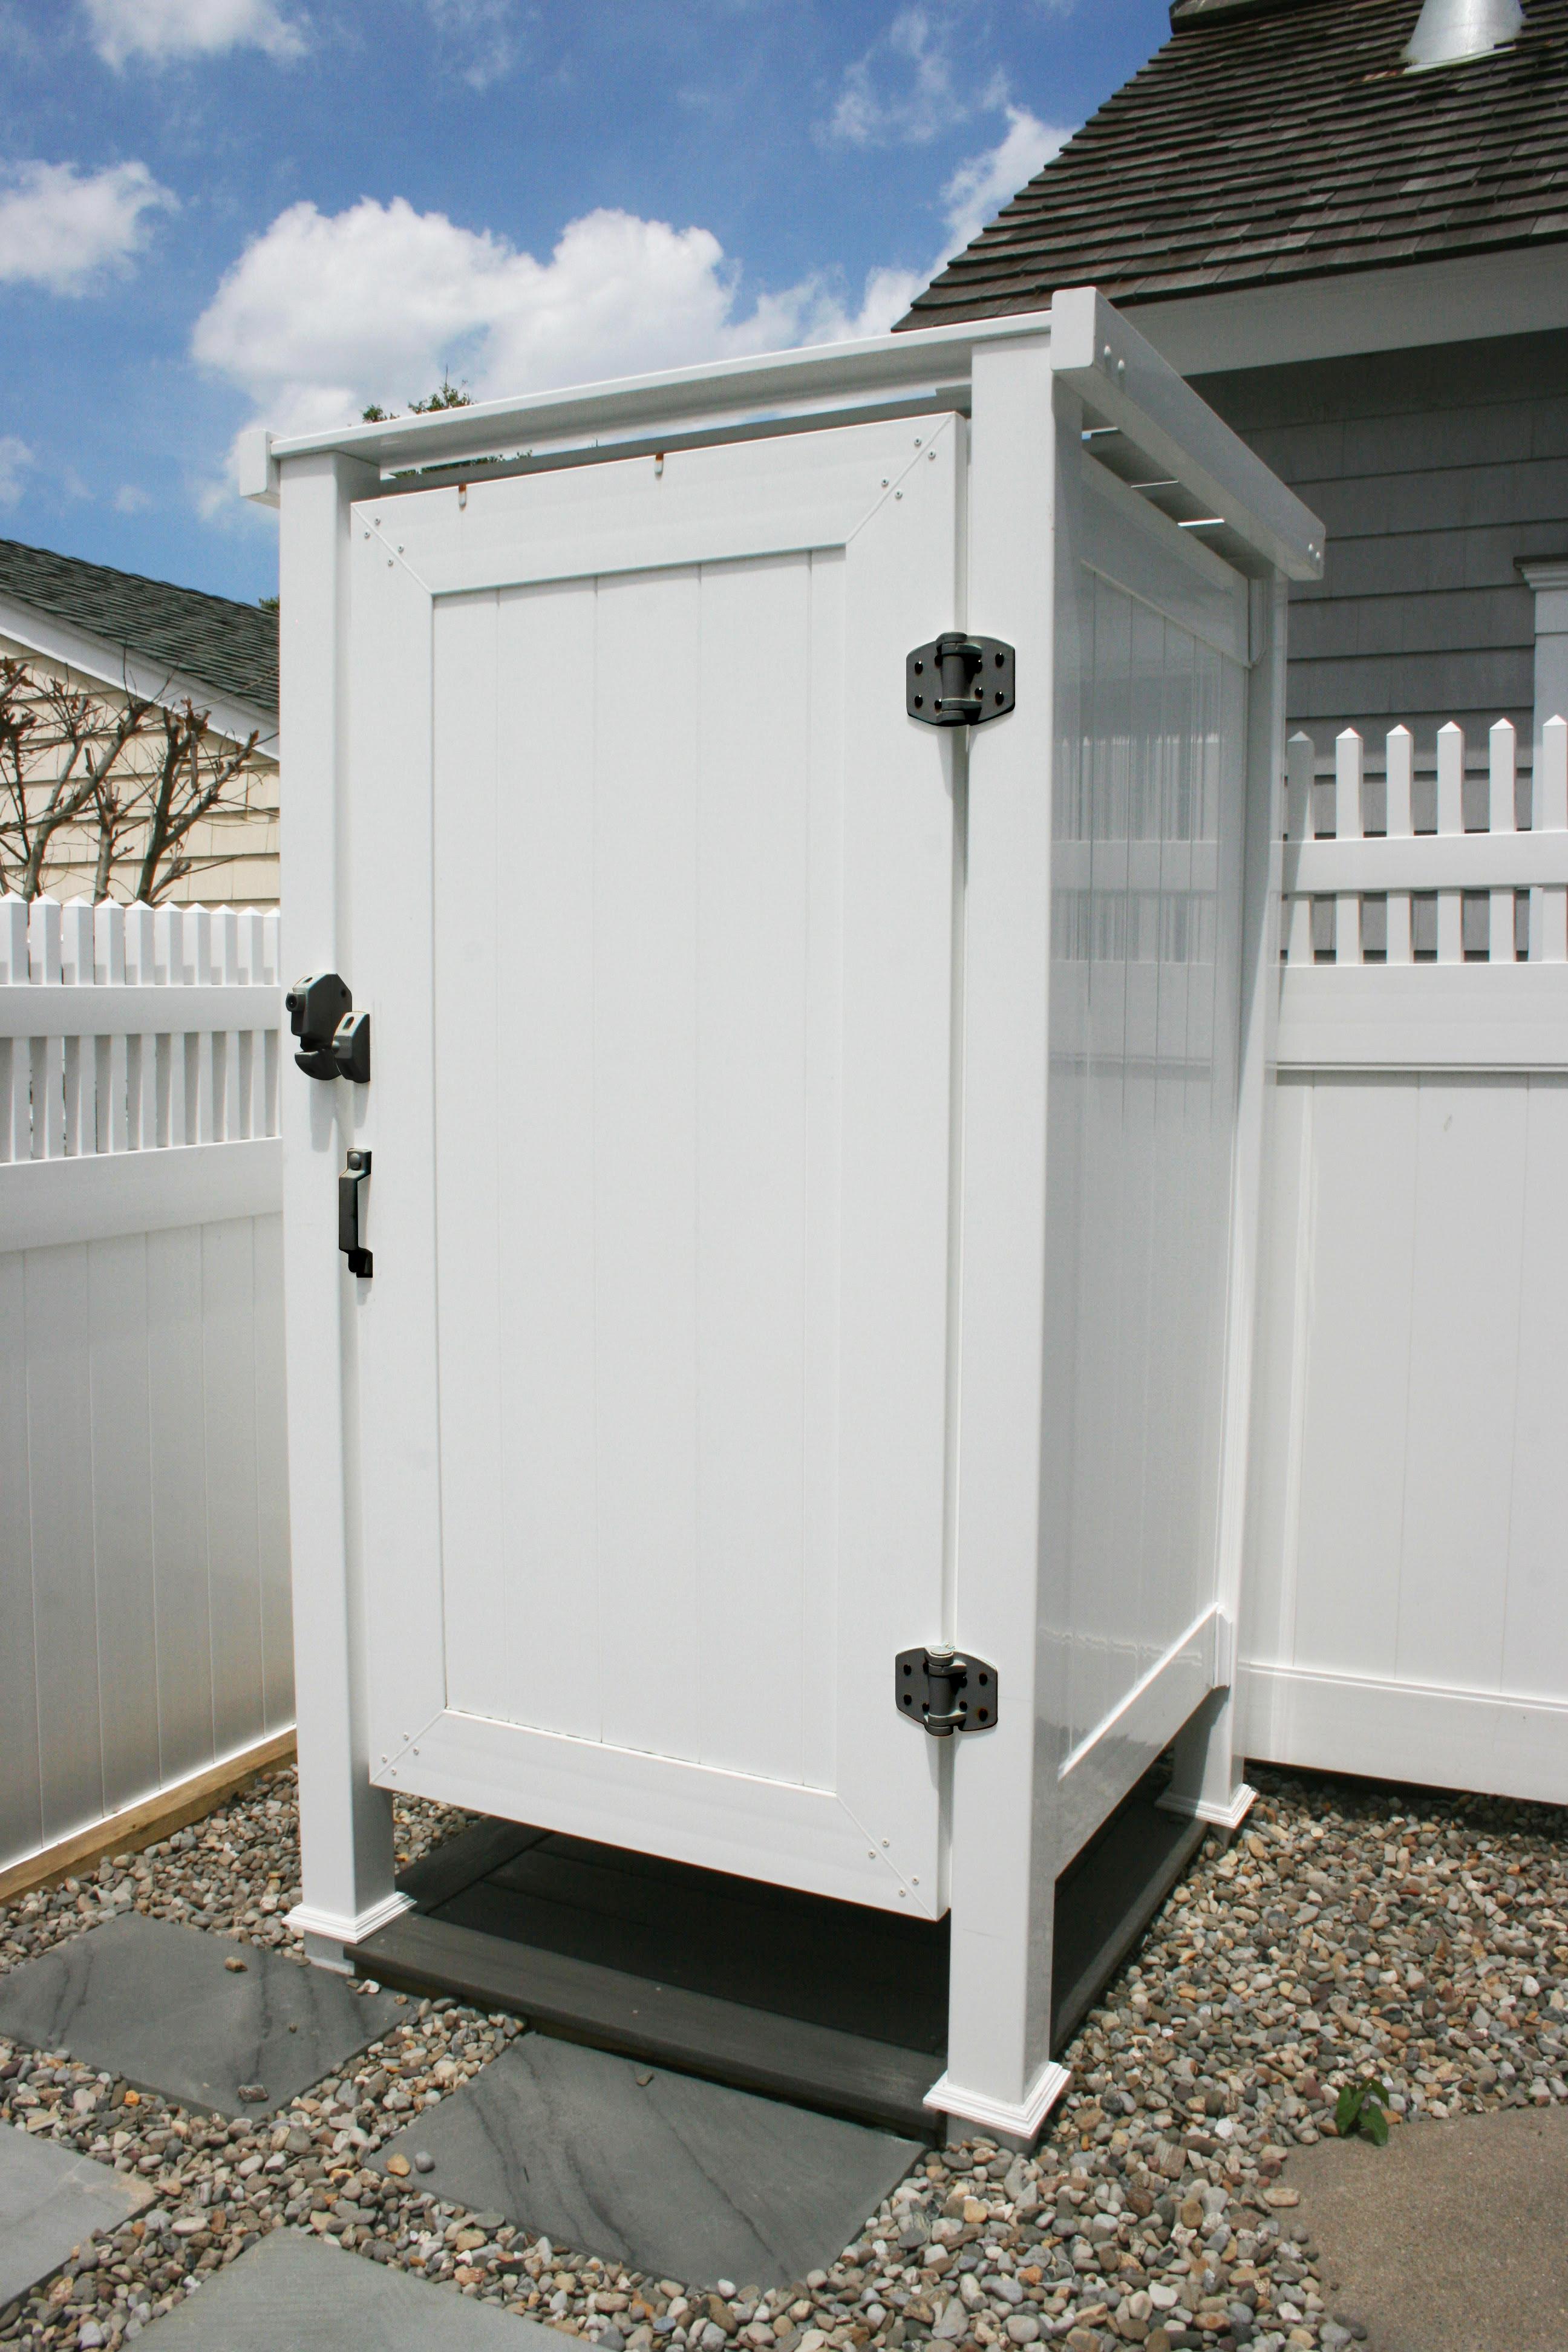 Phoenix Manufacturing Outdoor Shower Enclosure - Hardware